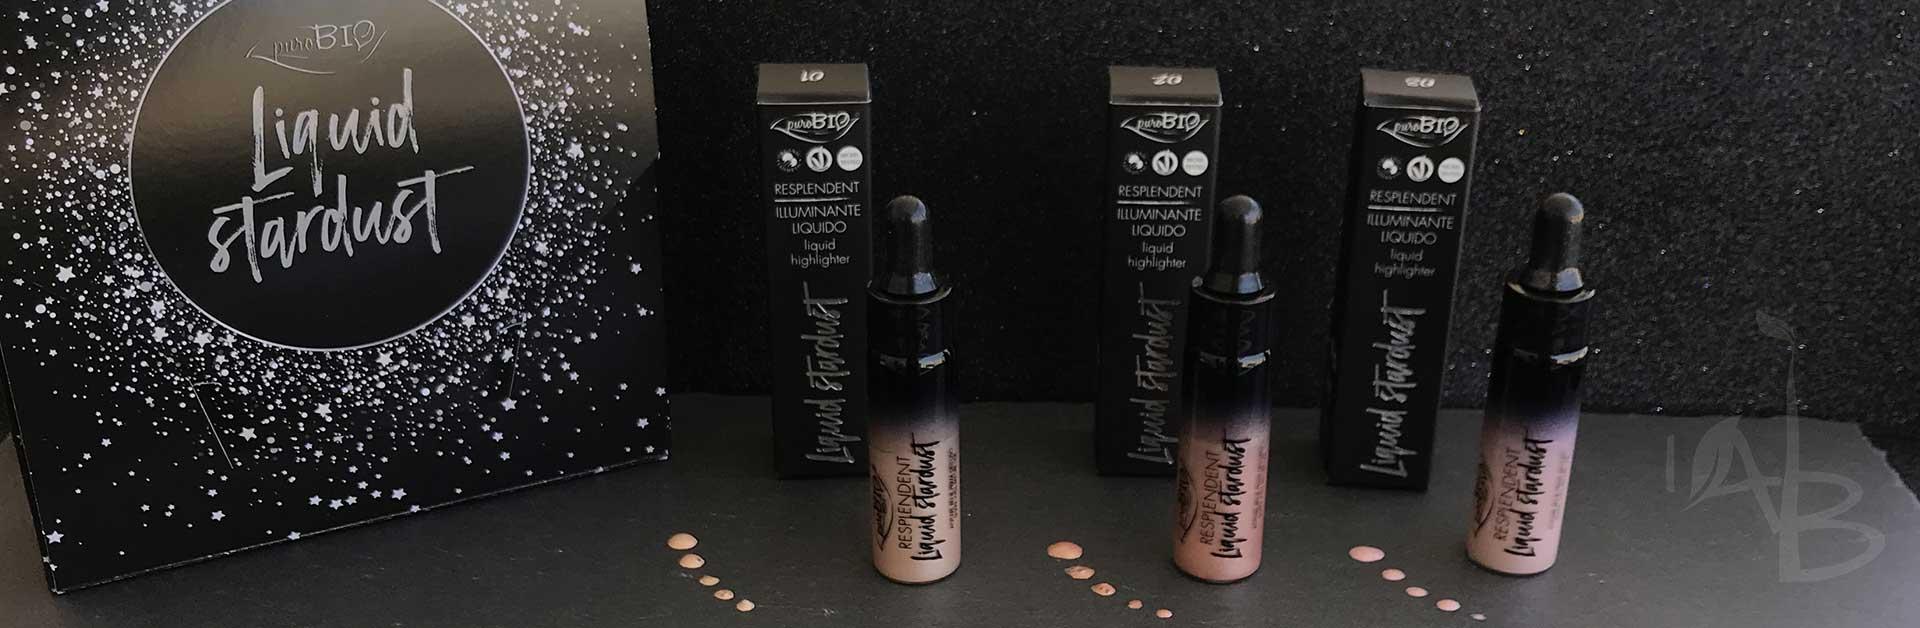 Illuminanti Liquid Stardust di Purobio Cosmetics